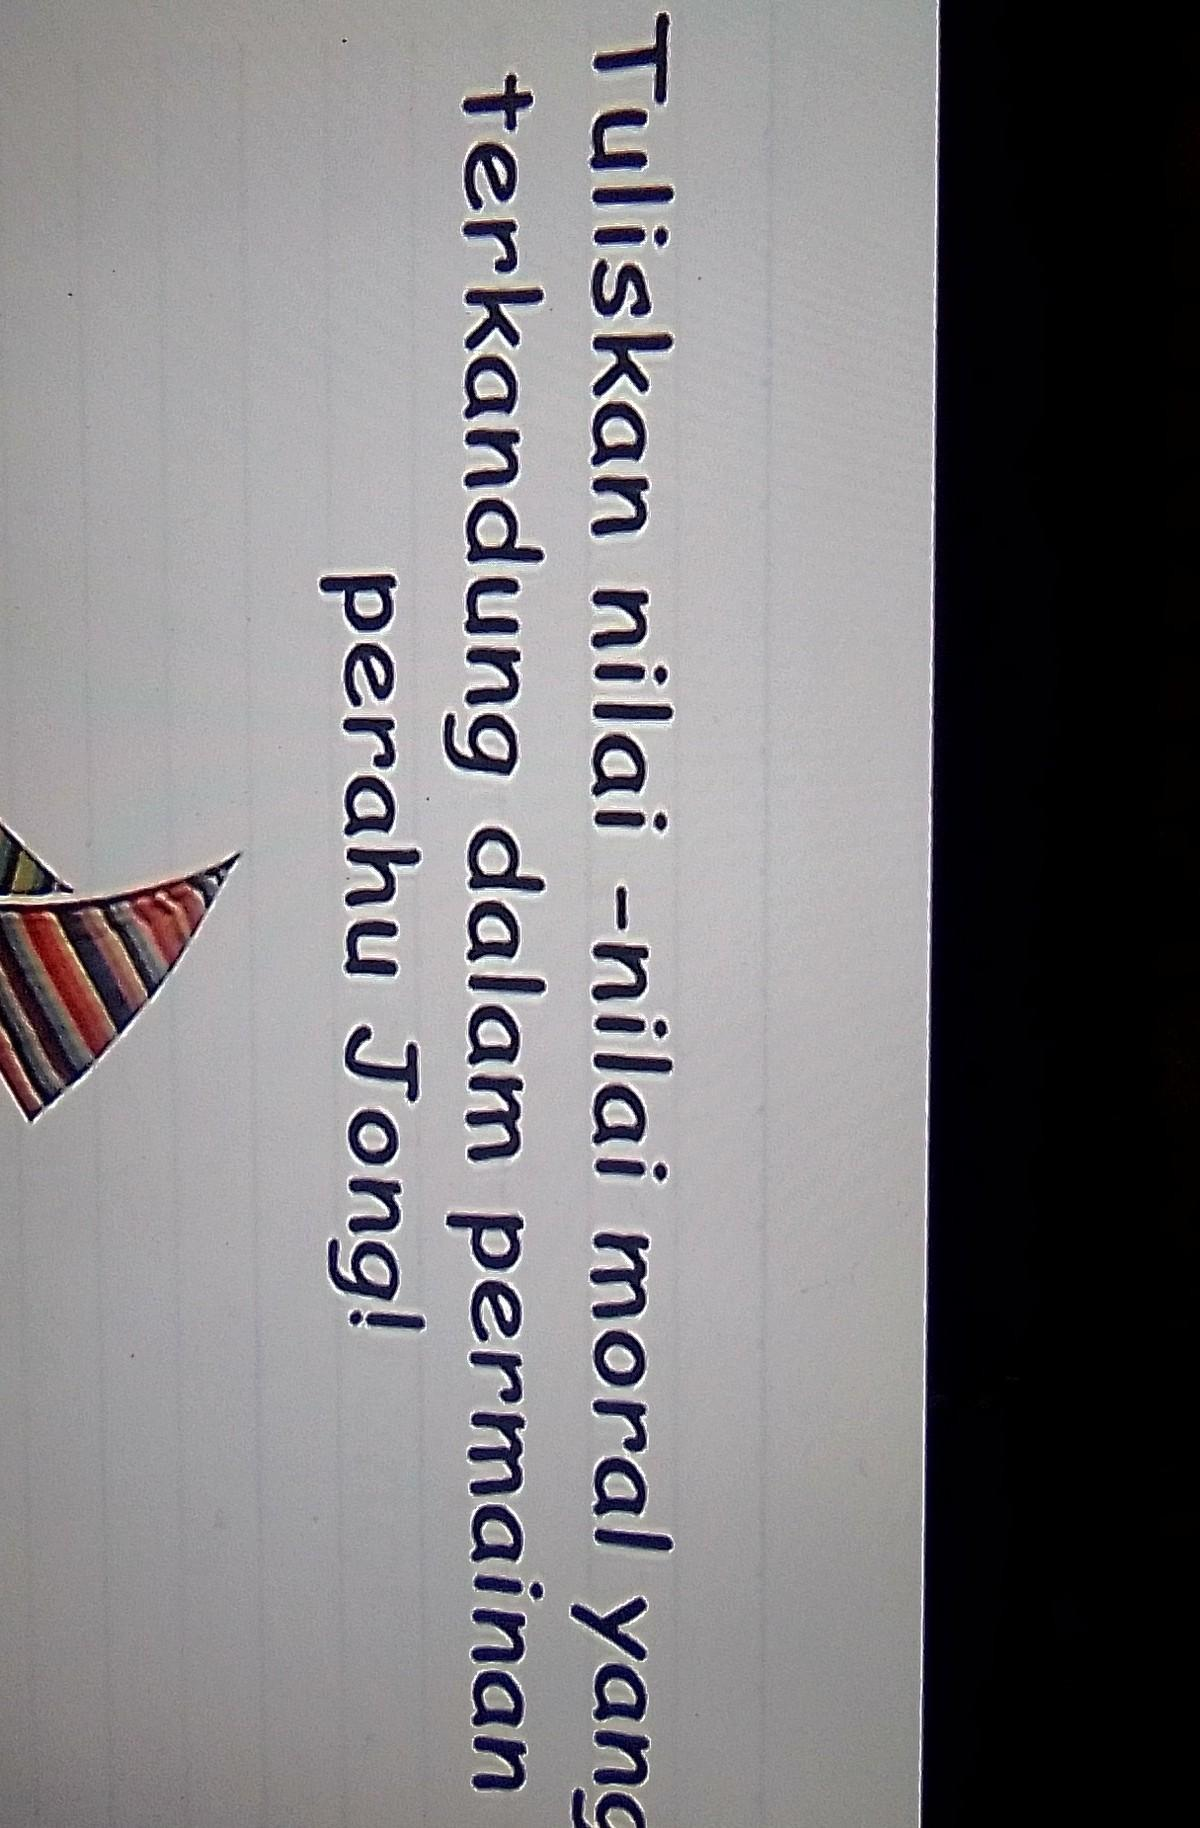 Tuliskan Nilai Nilai Moral Yang Terkandung Dalam Permainan Perahu Jong : tuliskan, nilai, moral, terkandung, dalam, permainan, perahu, Jawab, Kasih, Poinyg, Ngasal, Laporkan, Moderator, Brainly.co.id